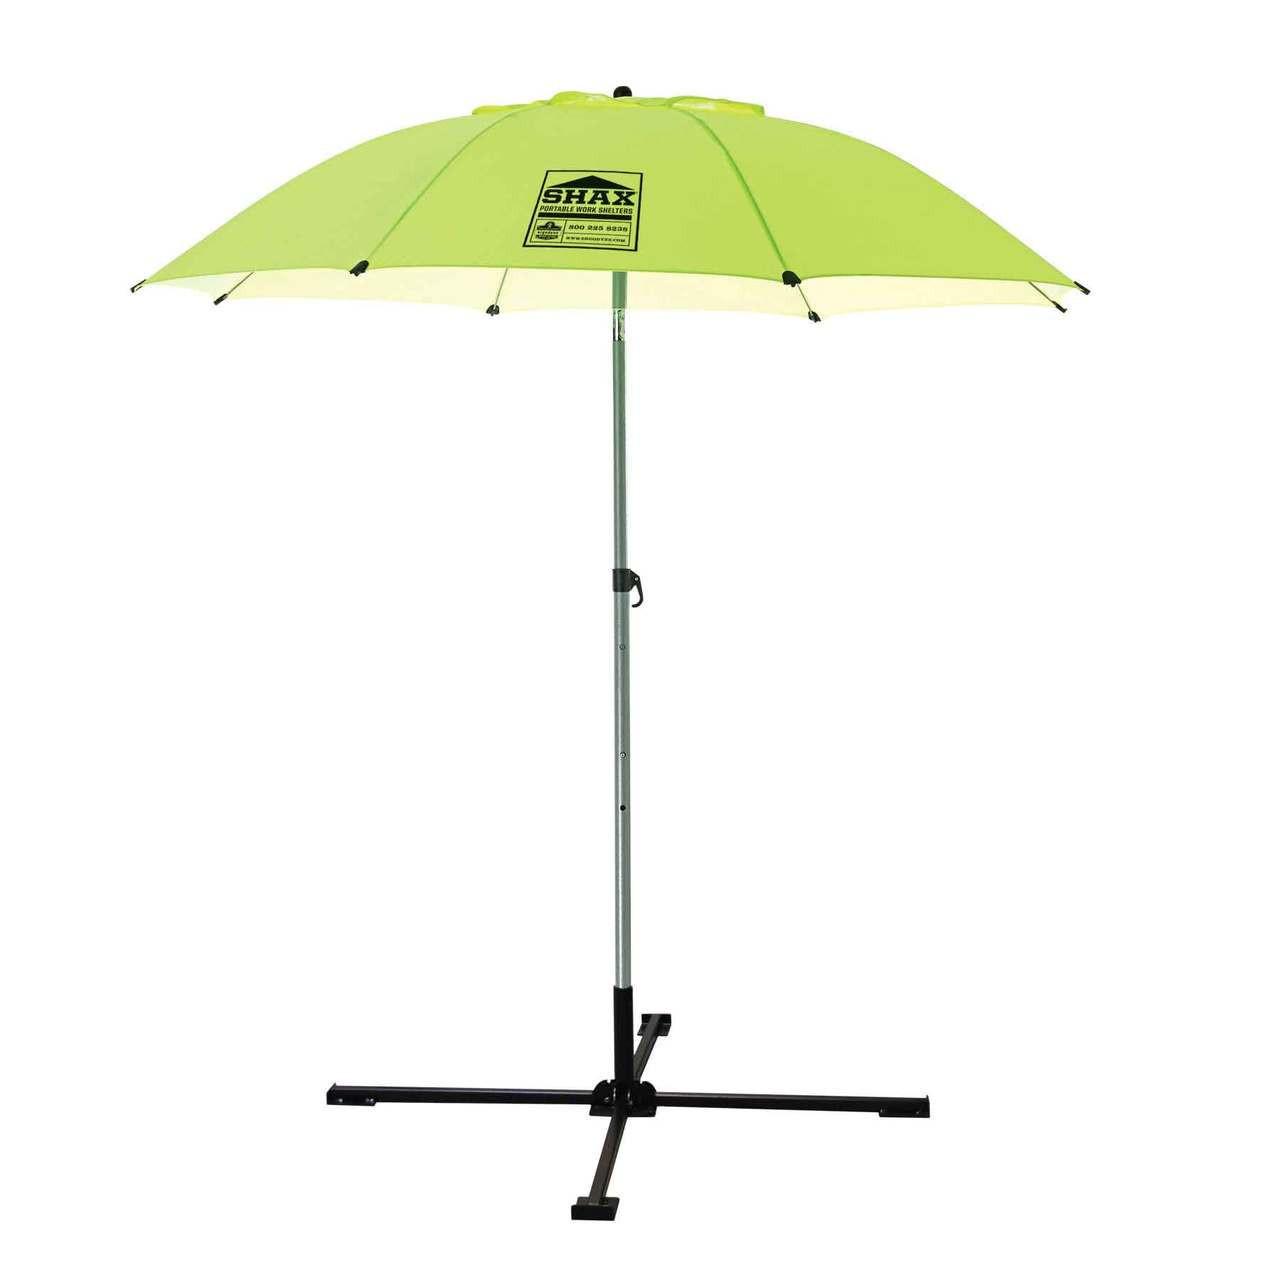 Ergodyne Shax 6100 Lime Lightweight Industrial Umbrella